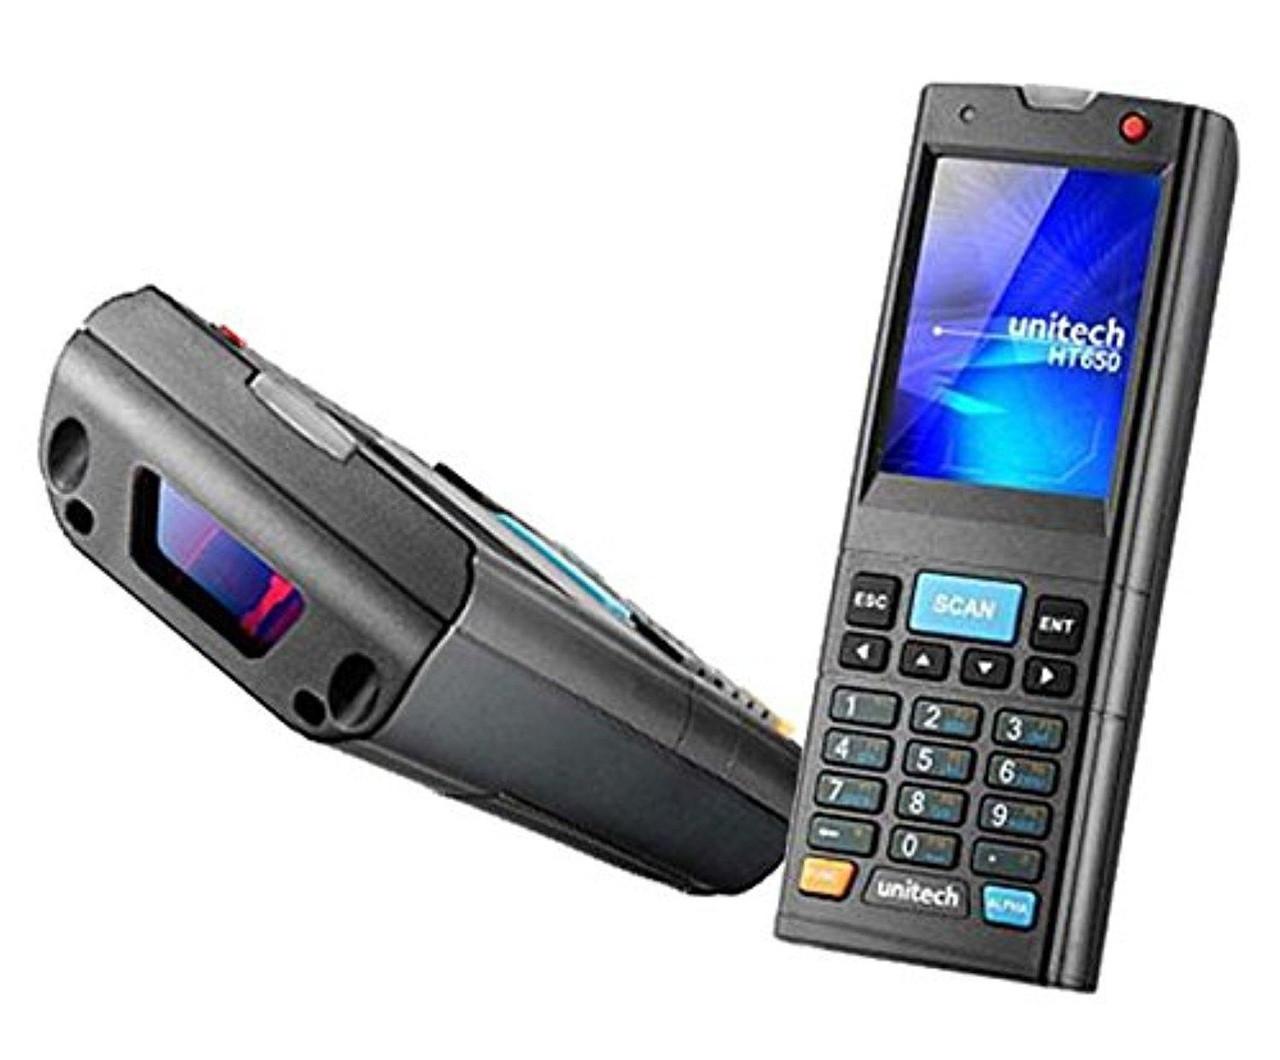 Unitech SRD650 Portable Data Terminal